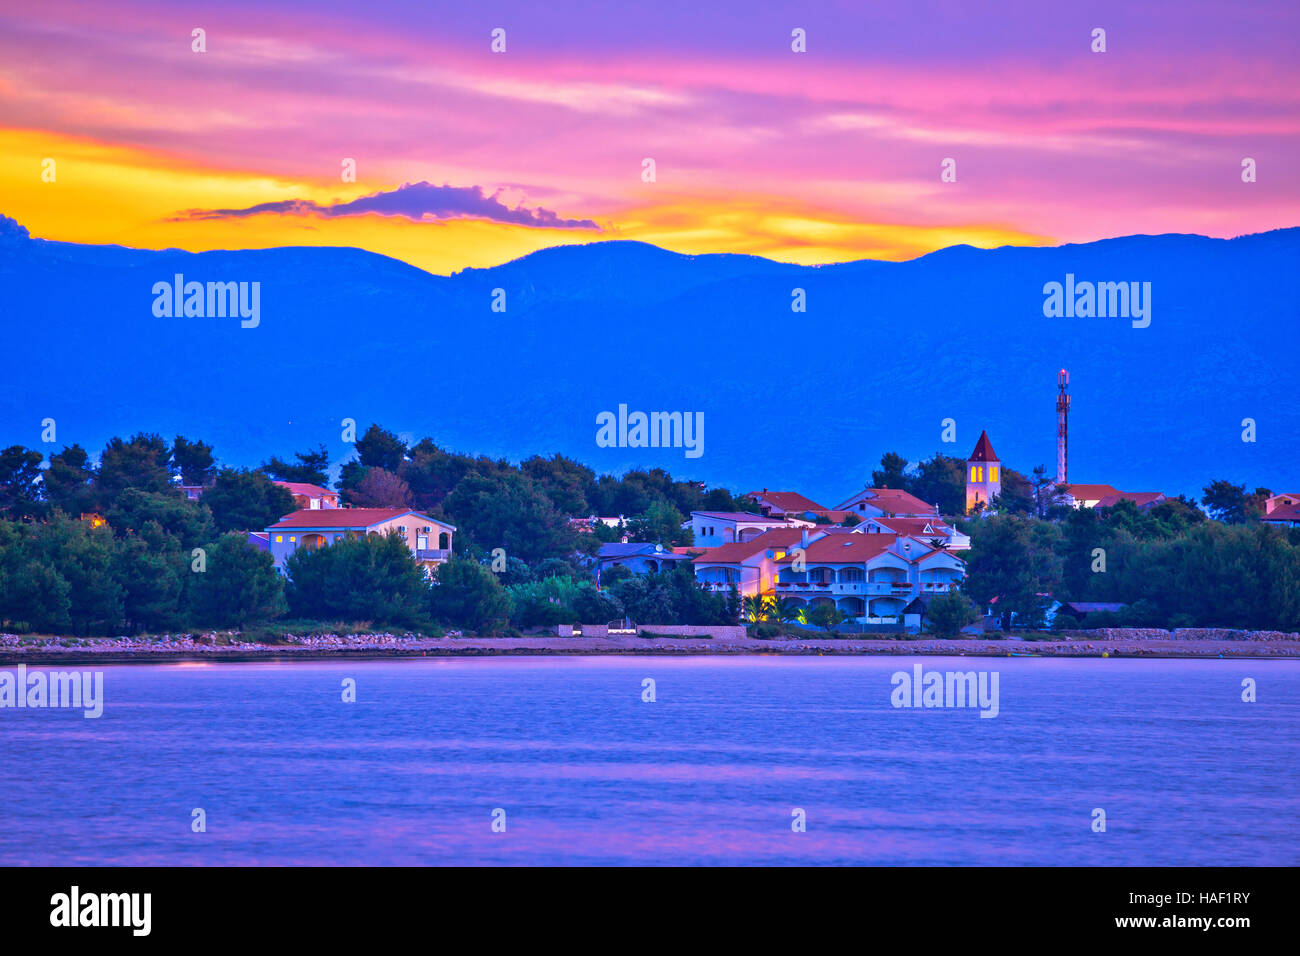 Colorful dawn on Vir island, coast and Velebit mountain view, Dalmatia, Croata Stock Photo